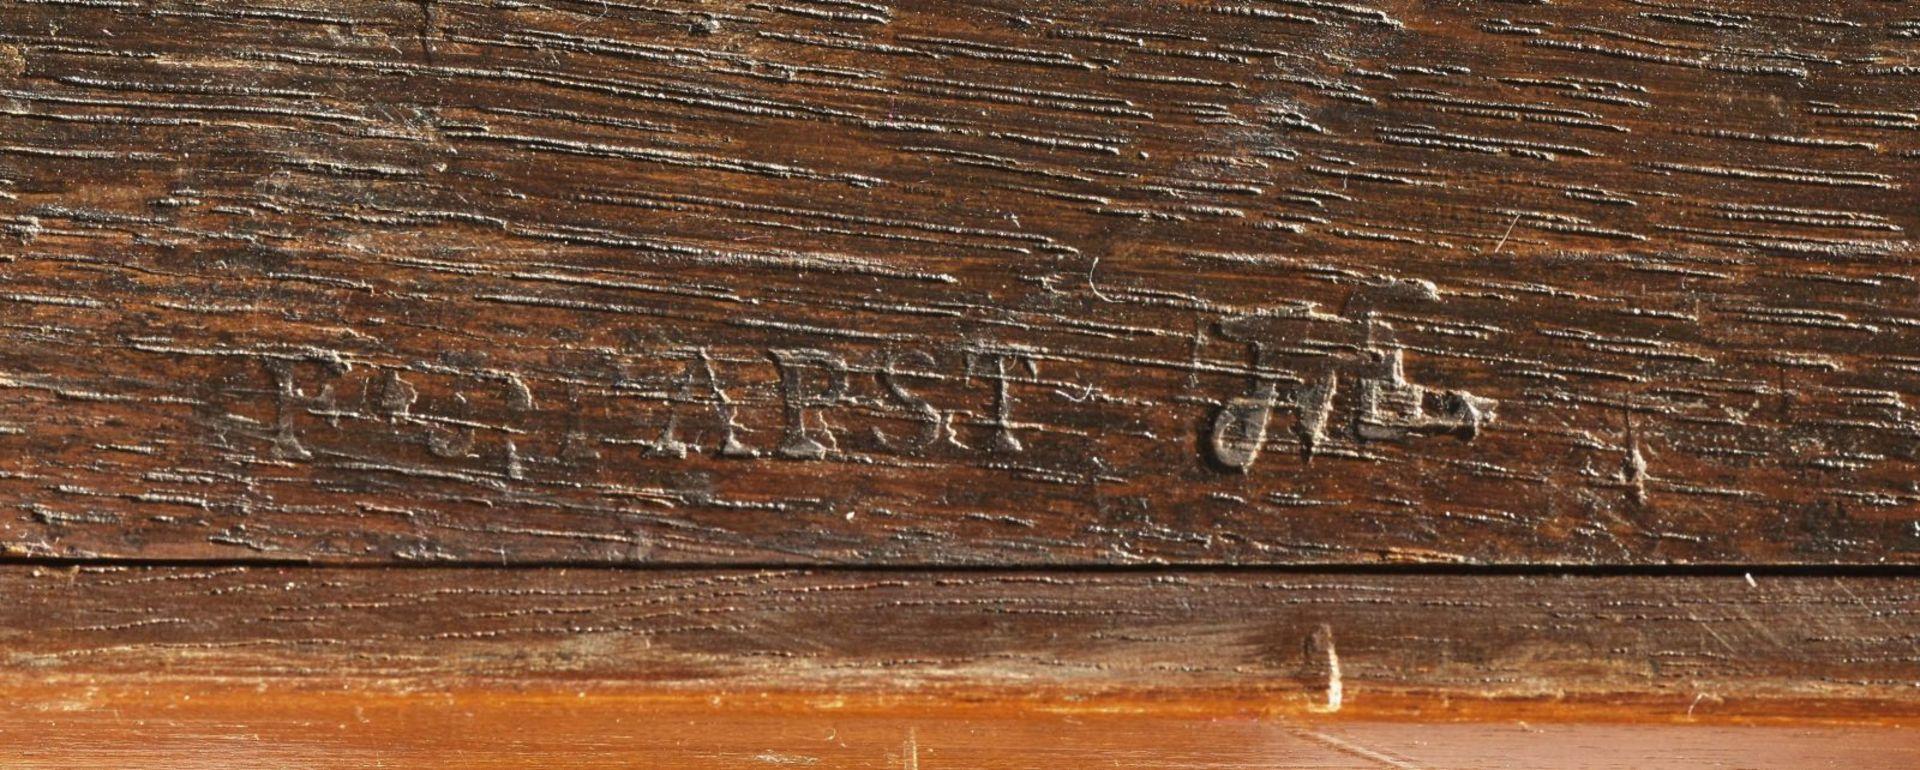 Schreibschrank (Secrétaire à abattant) - Image 3 of 3